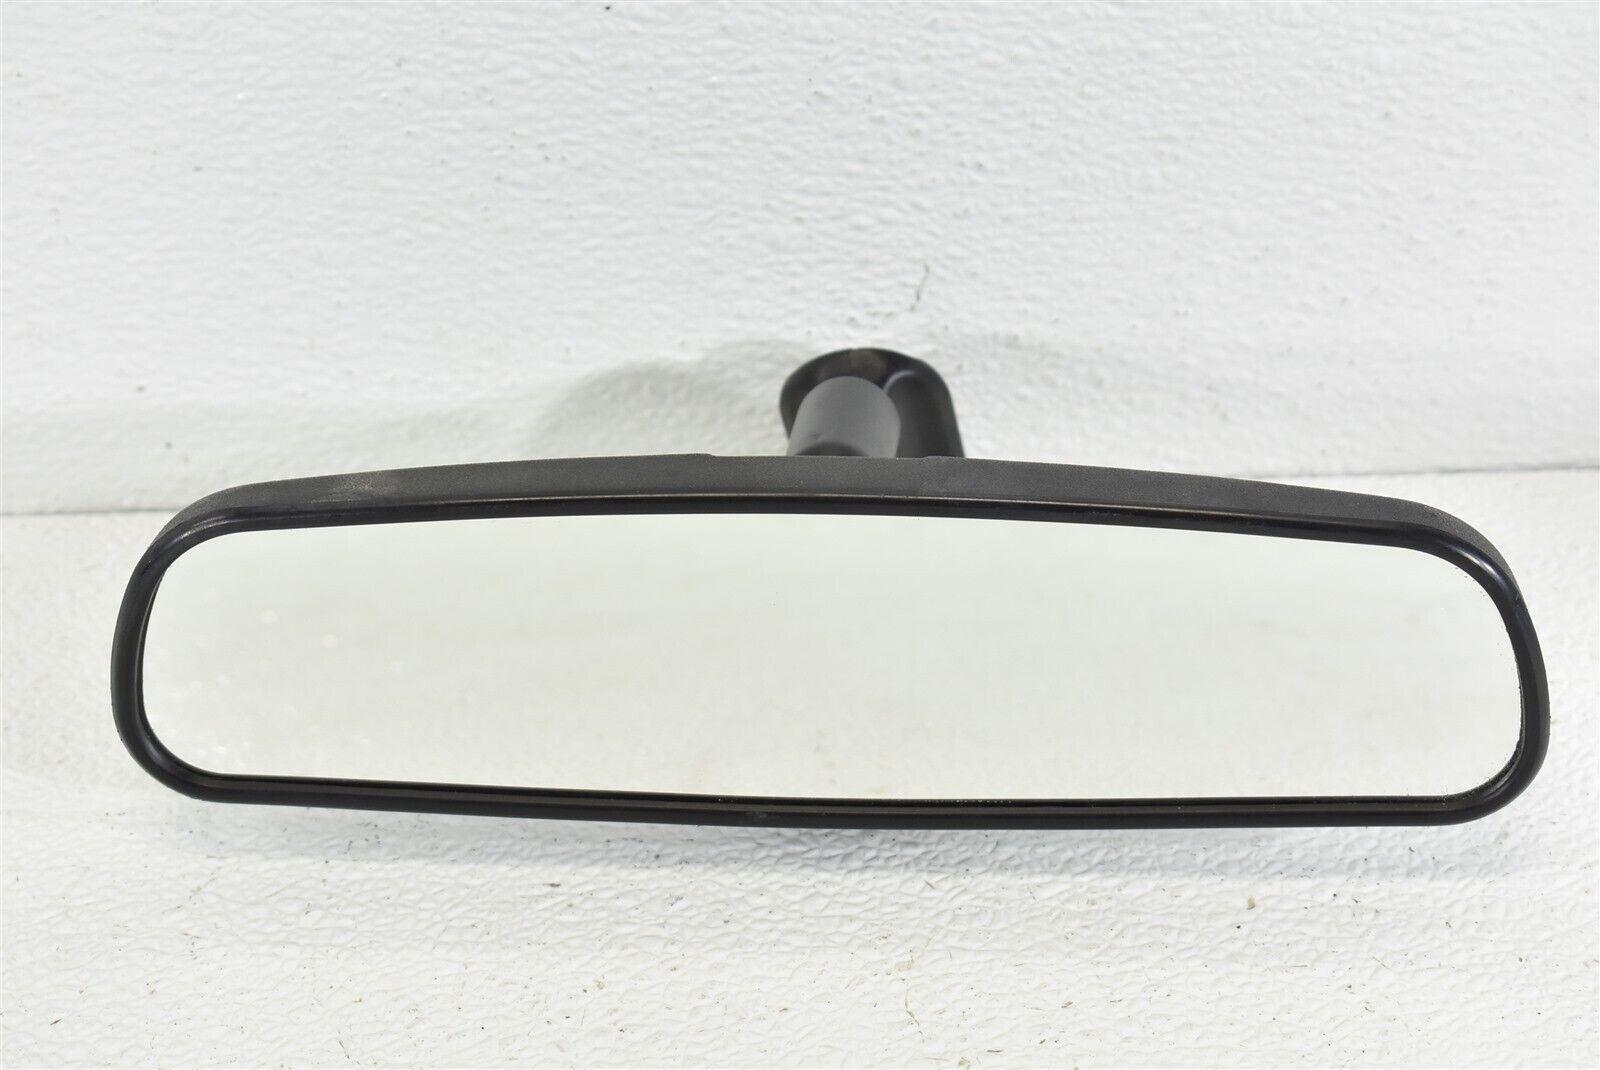 02-07 Subaru Impreza WRX OR STI Horn Single Alarm 2002-2007